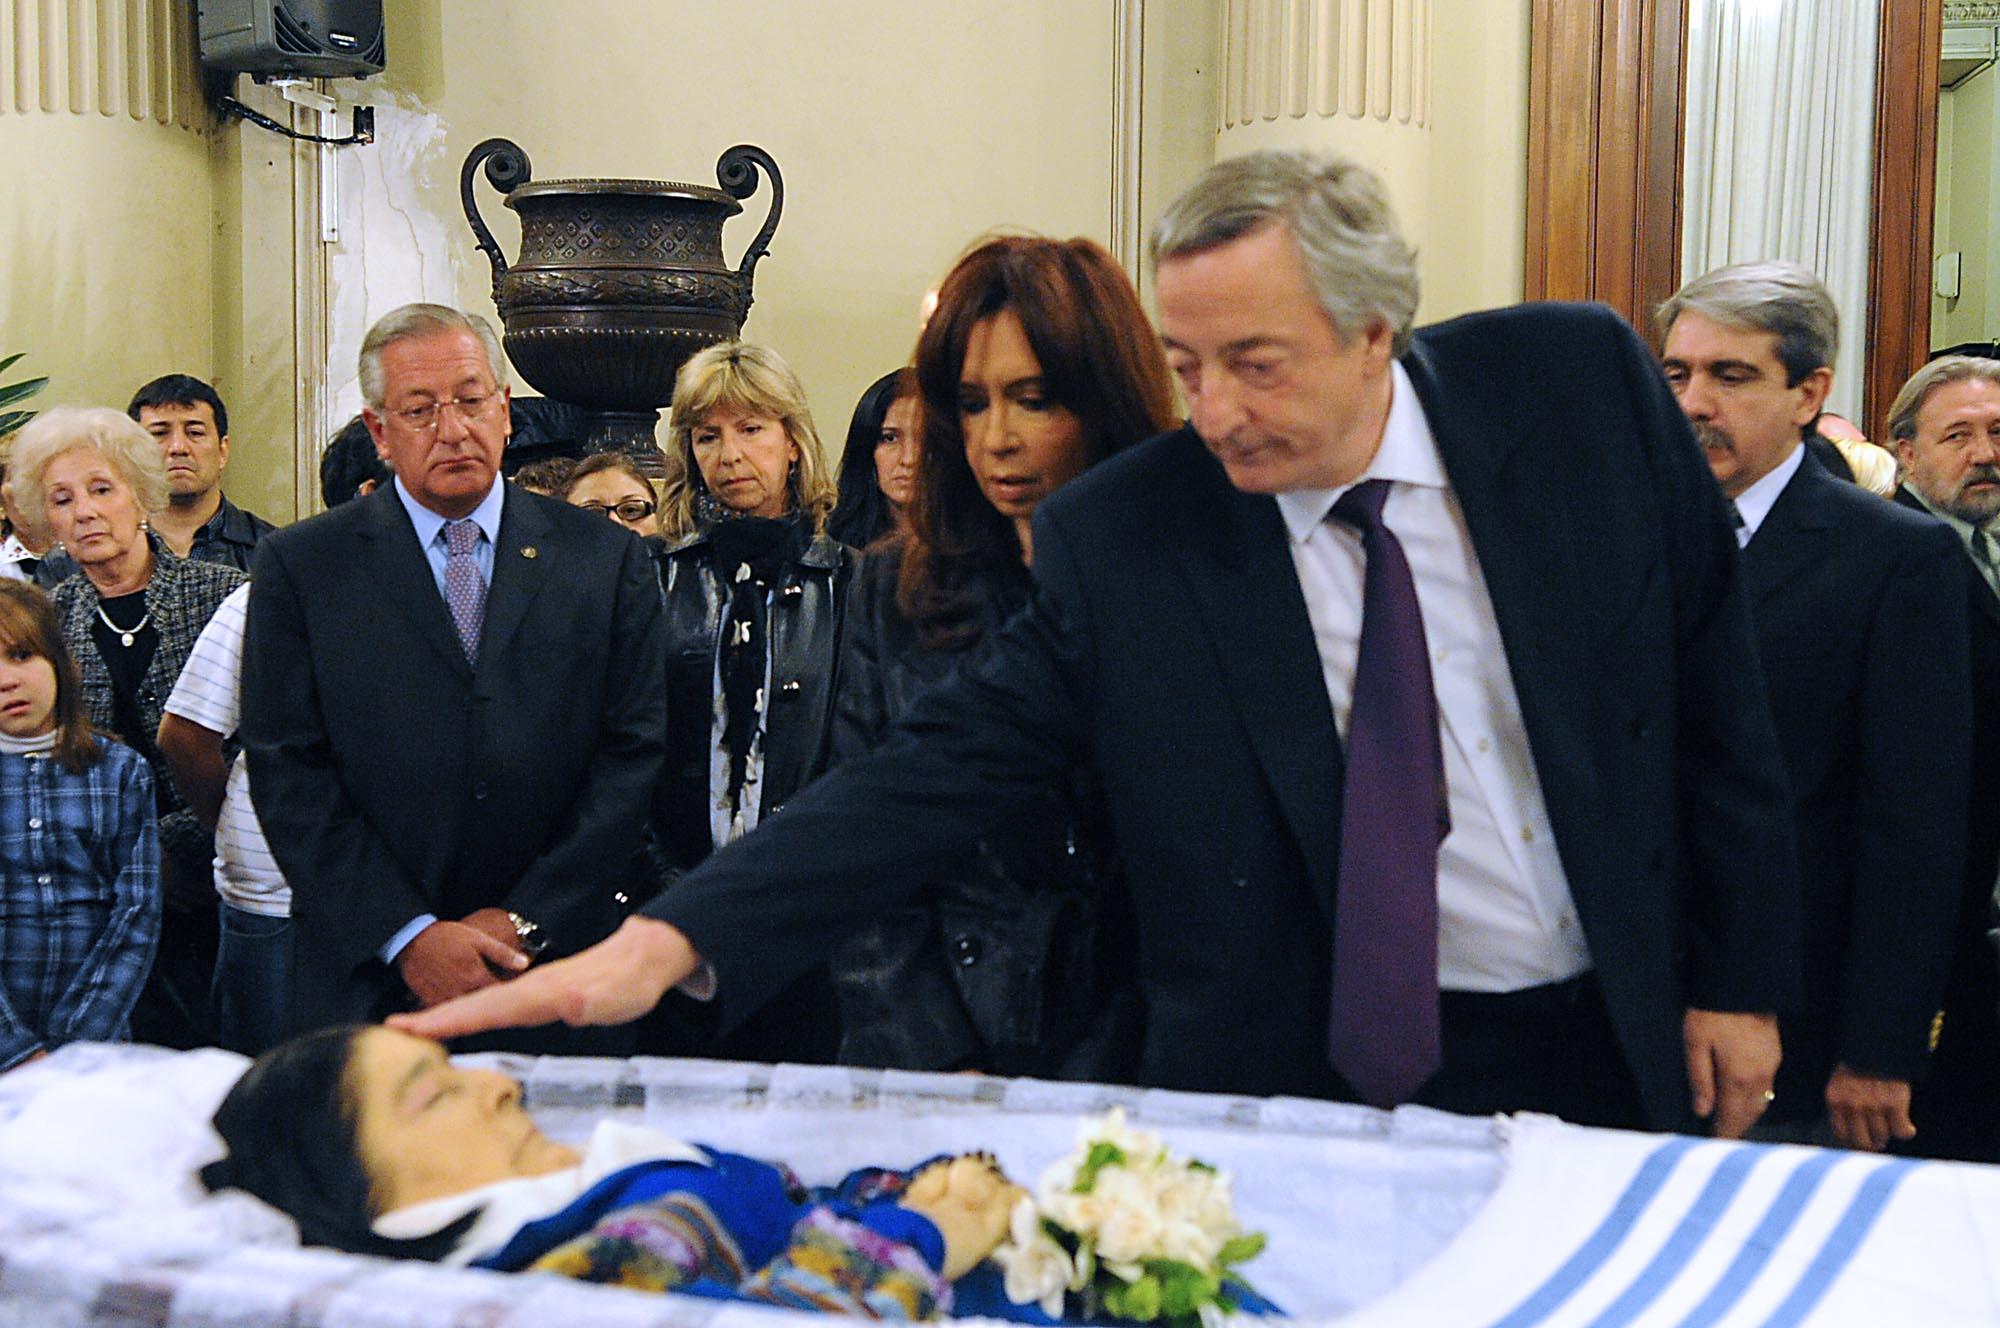 Mercedes Sosa velada en el Parlamento. El expresidente Néstor Kirchner (1950-2010) le toca la frente.